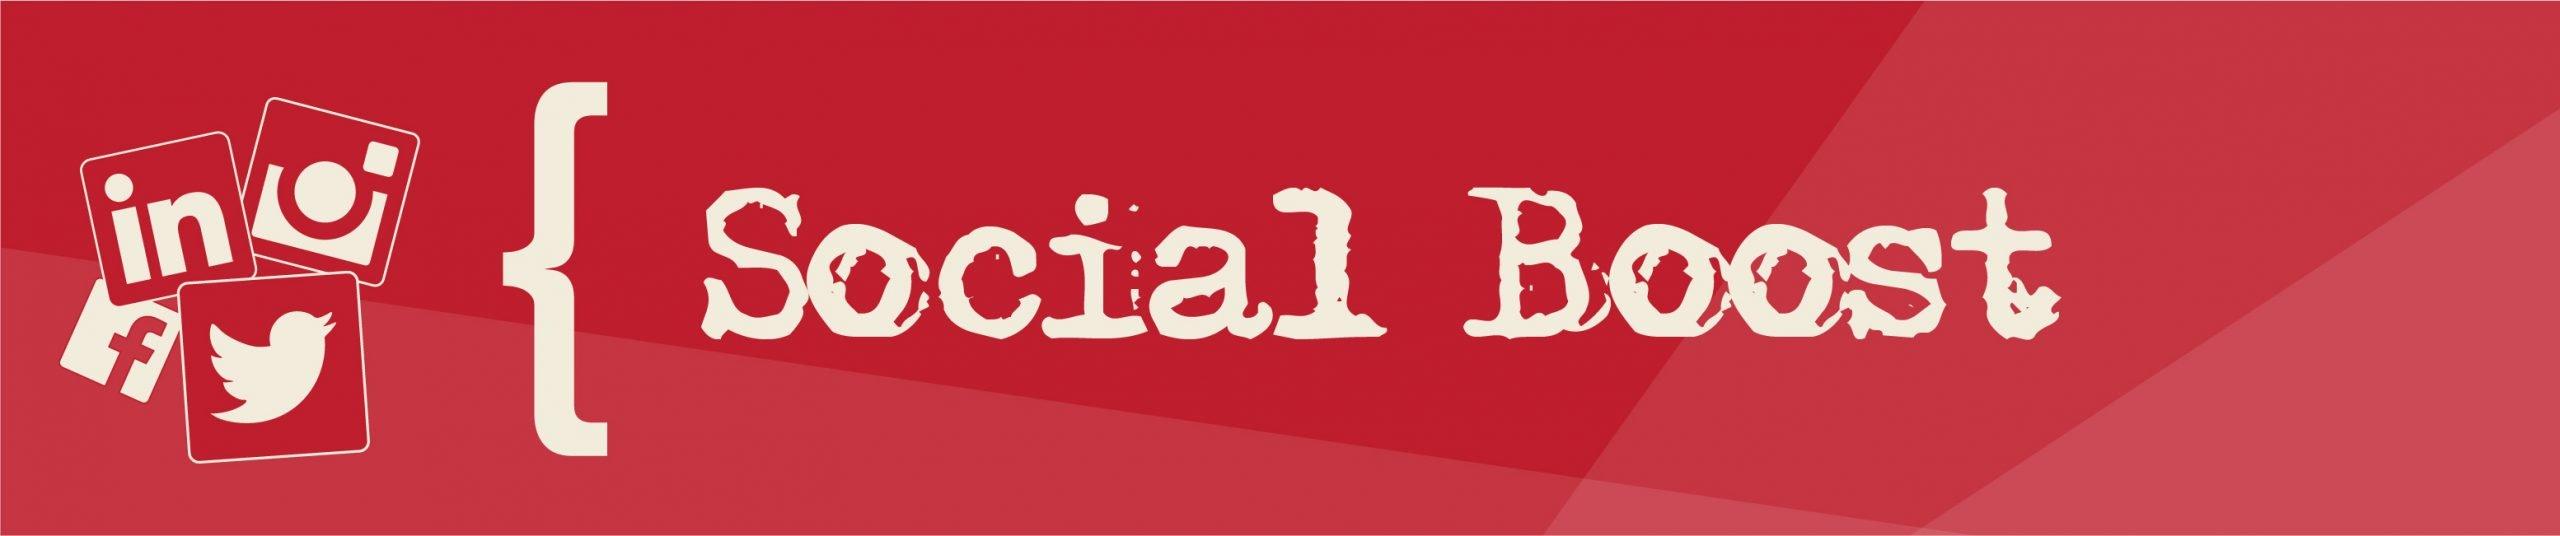 Social Boost Banner